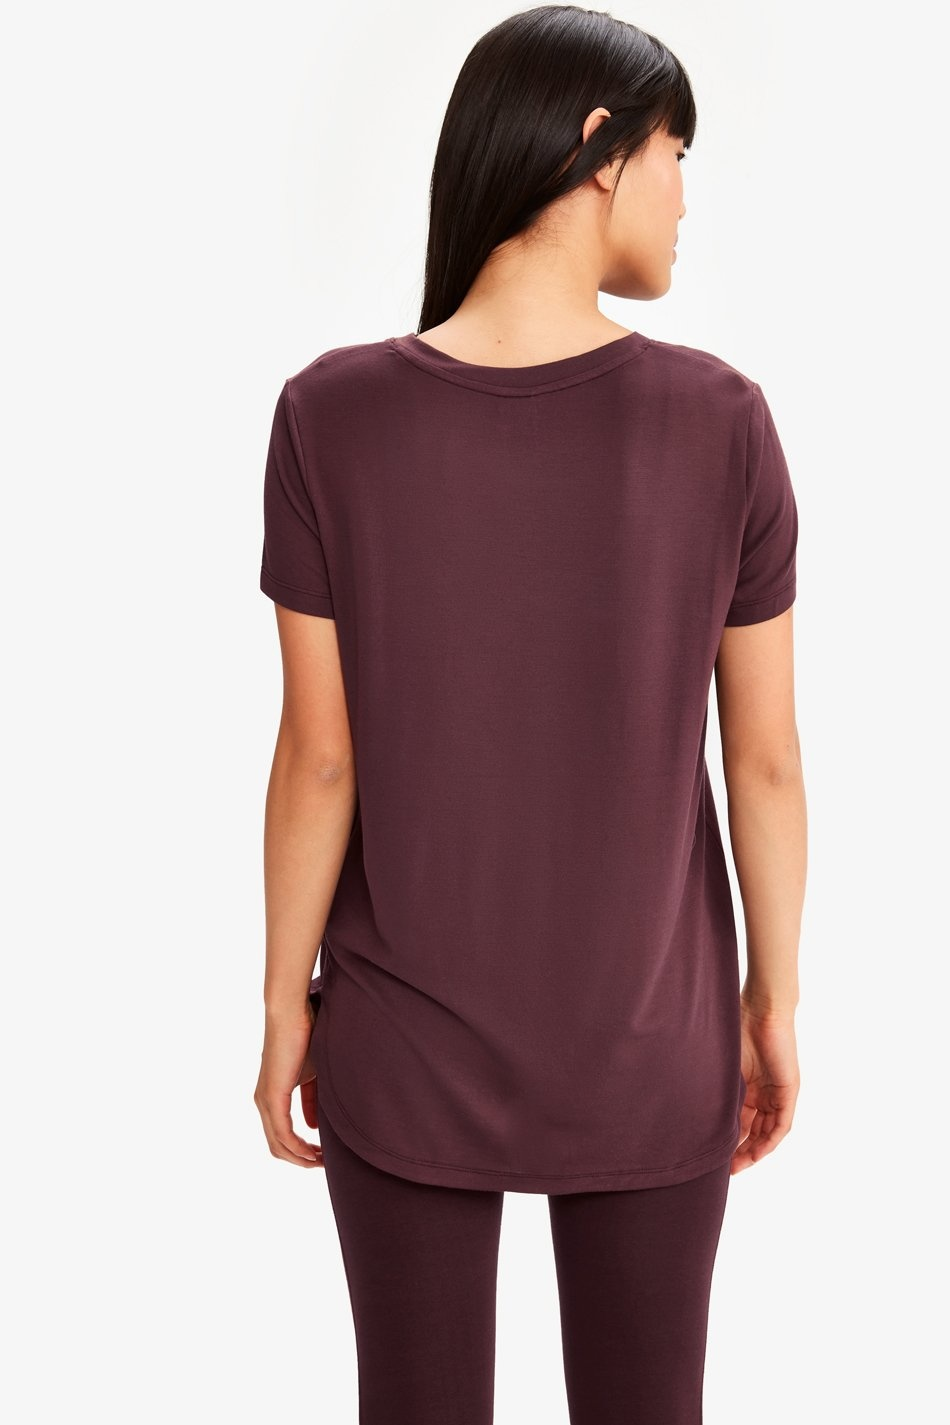 Lole Agda V Neck Tee Shirt